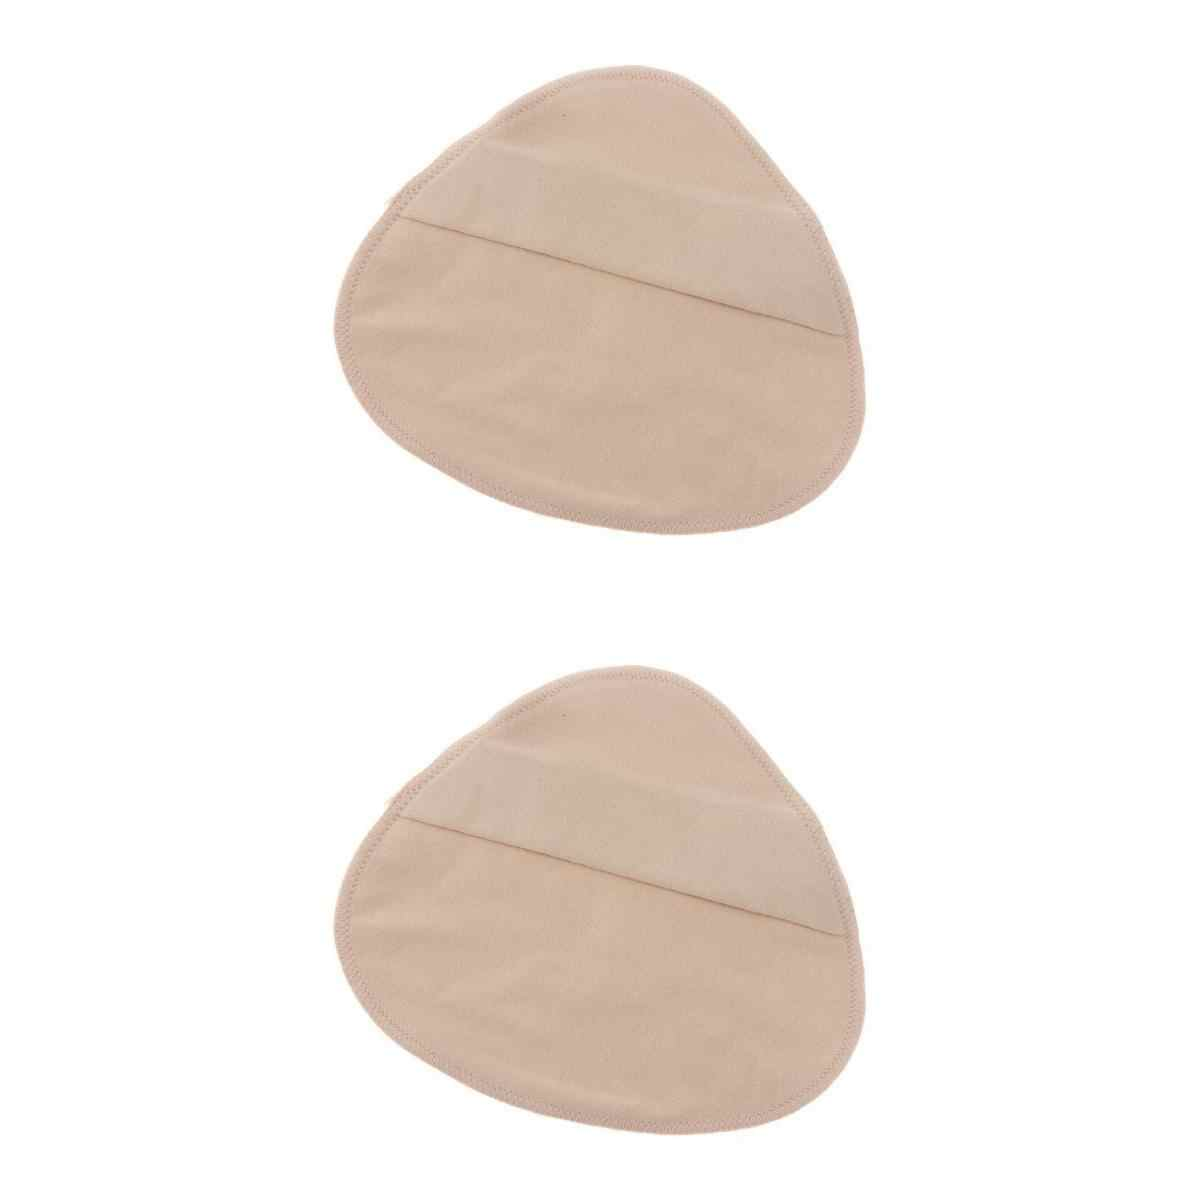 2 piezas, bolsillo protector de algodón para mastectomía, prótesis de silicona, prótesis forma de mama Artificial, fundas para pechos falsos